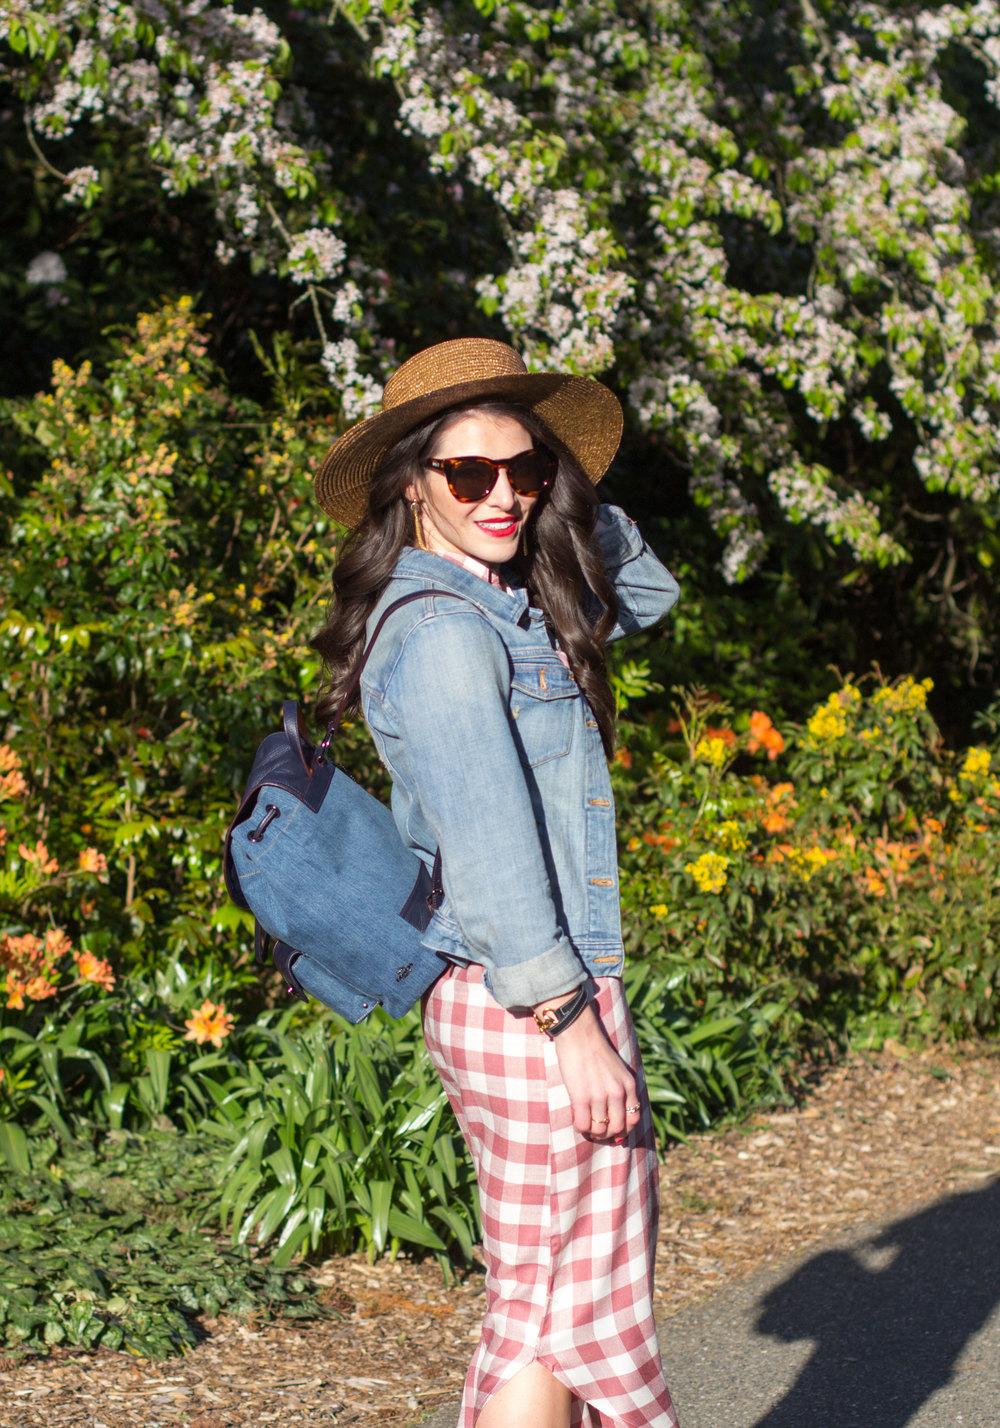 "BB Dakota ""Lance"" Dress, Cute Summer Outfits, How to Style a Shirt Dress 3 Ways, Budget Friendly Shopping Tips"